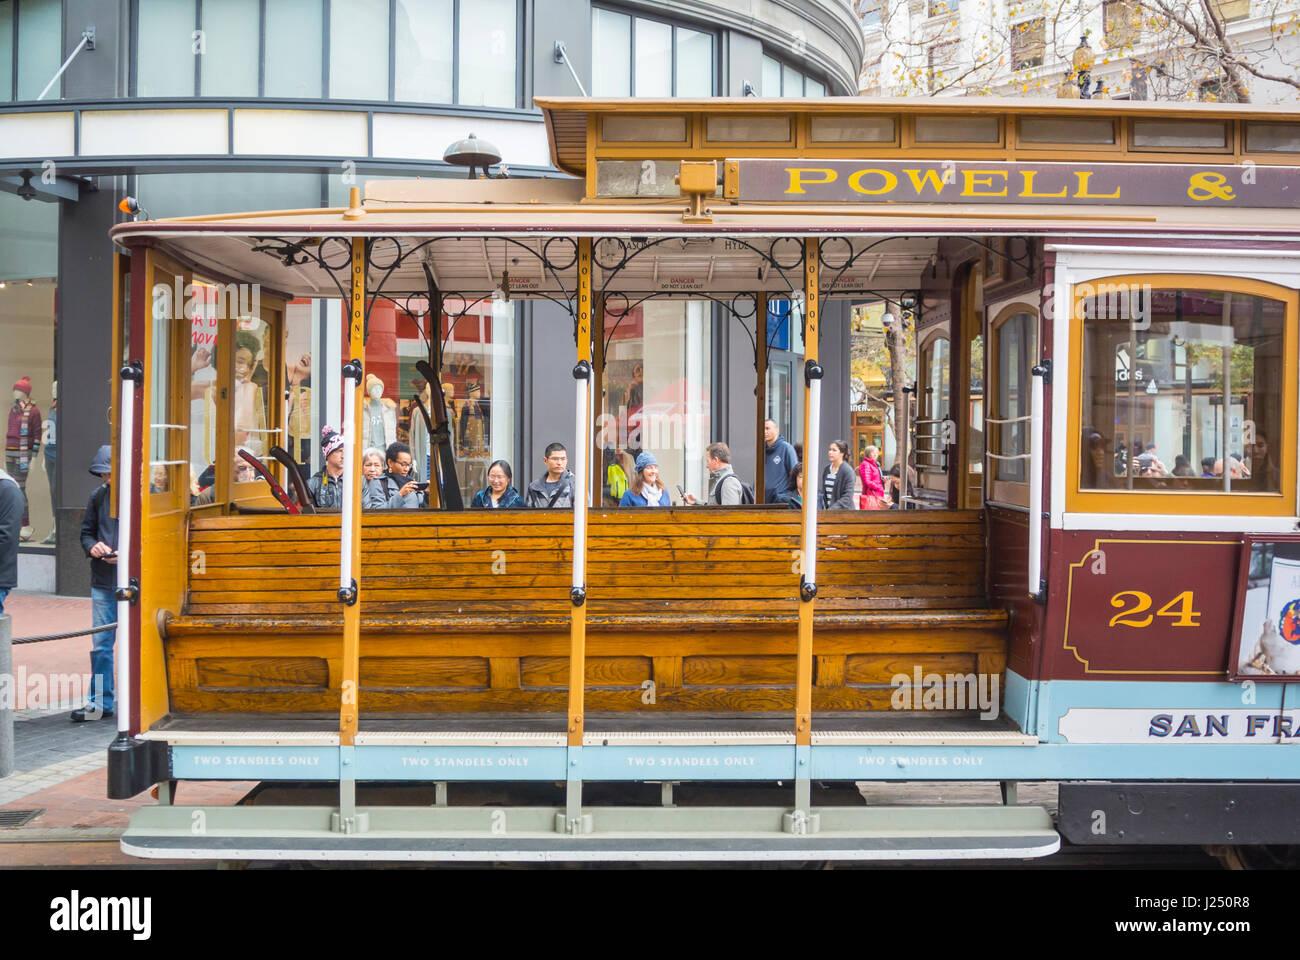 San Francisco, California, United States of America, North America, cable car - Stock Image